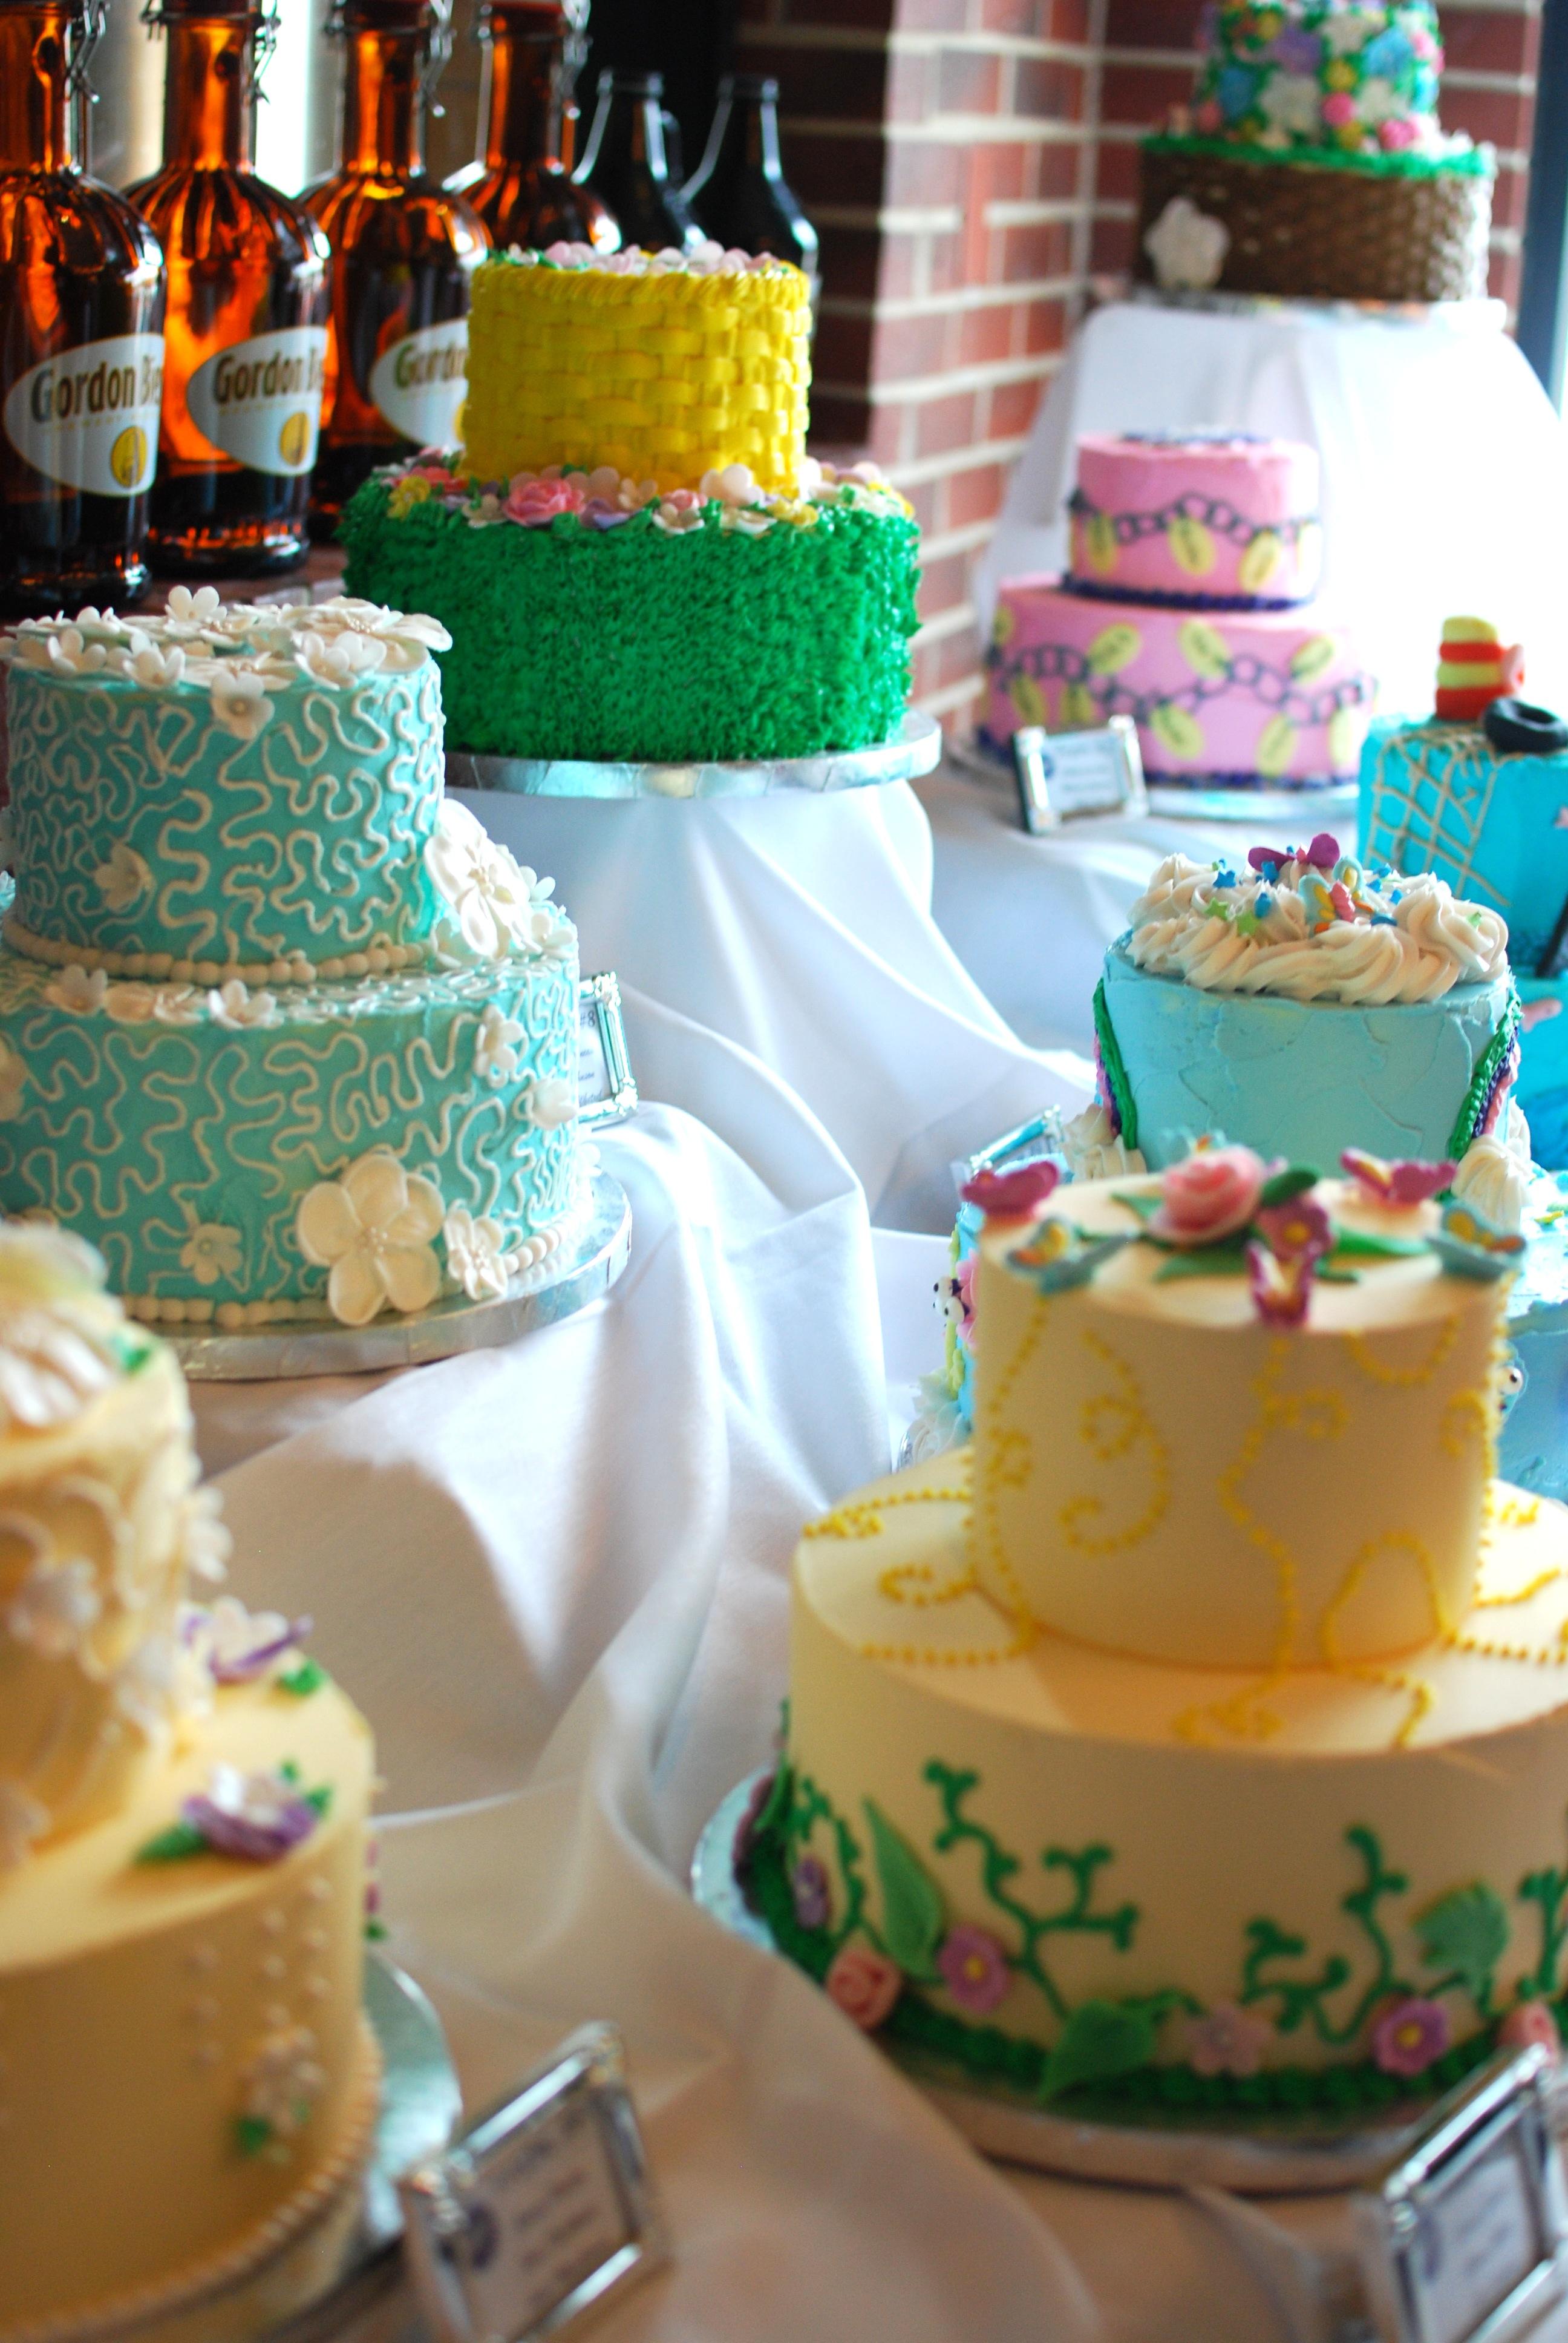 Cake Decorating Supplies Chirnside Park